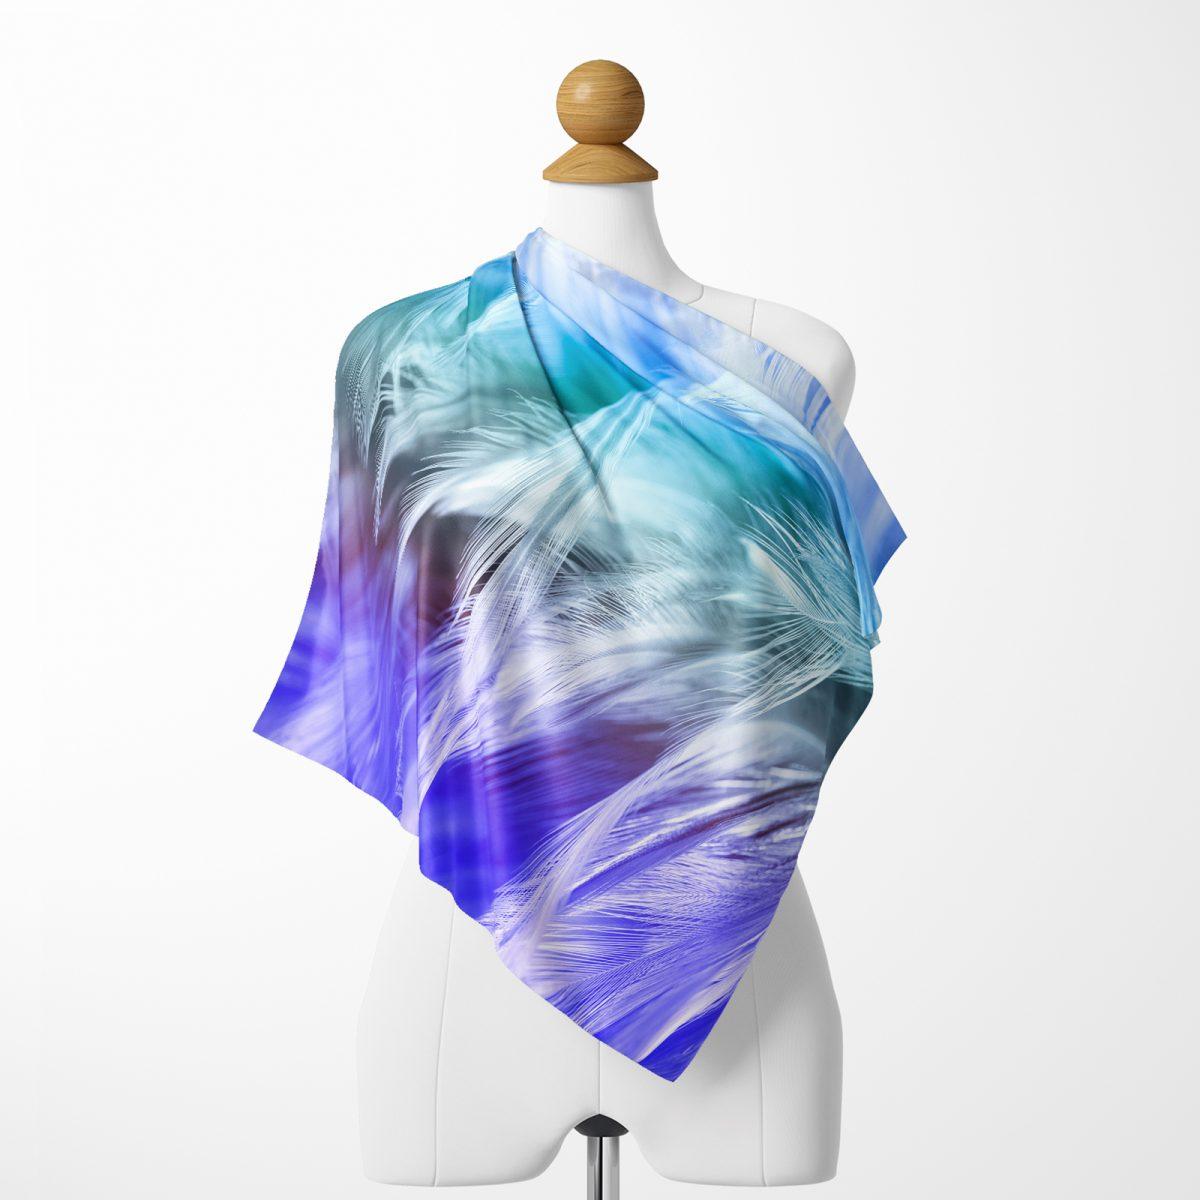 RealHomes Moda Özel Tasarım Dijital Baskılı Modern Tivil Eşarp Realhomes